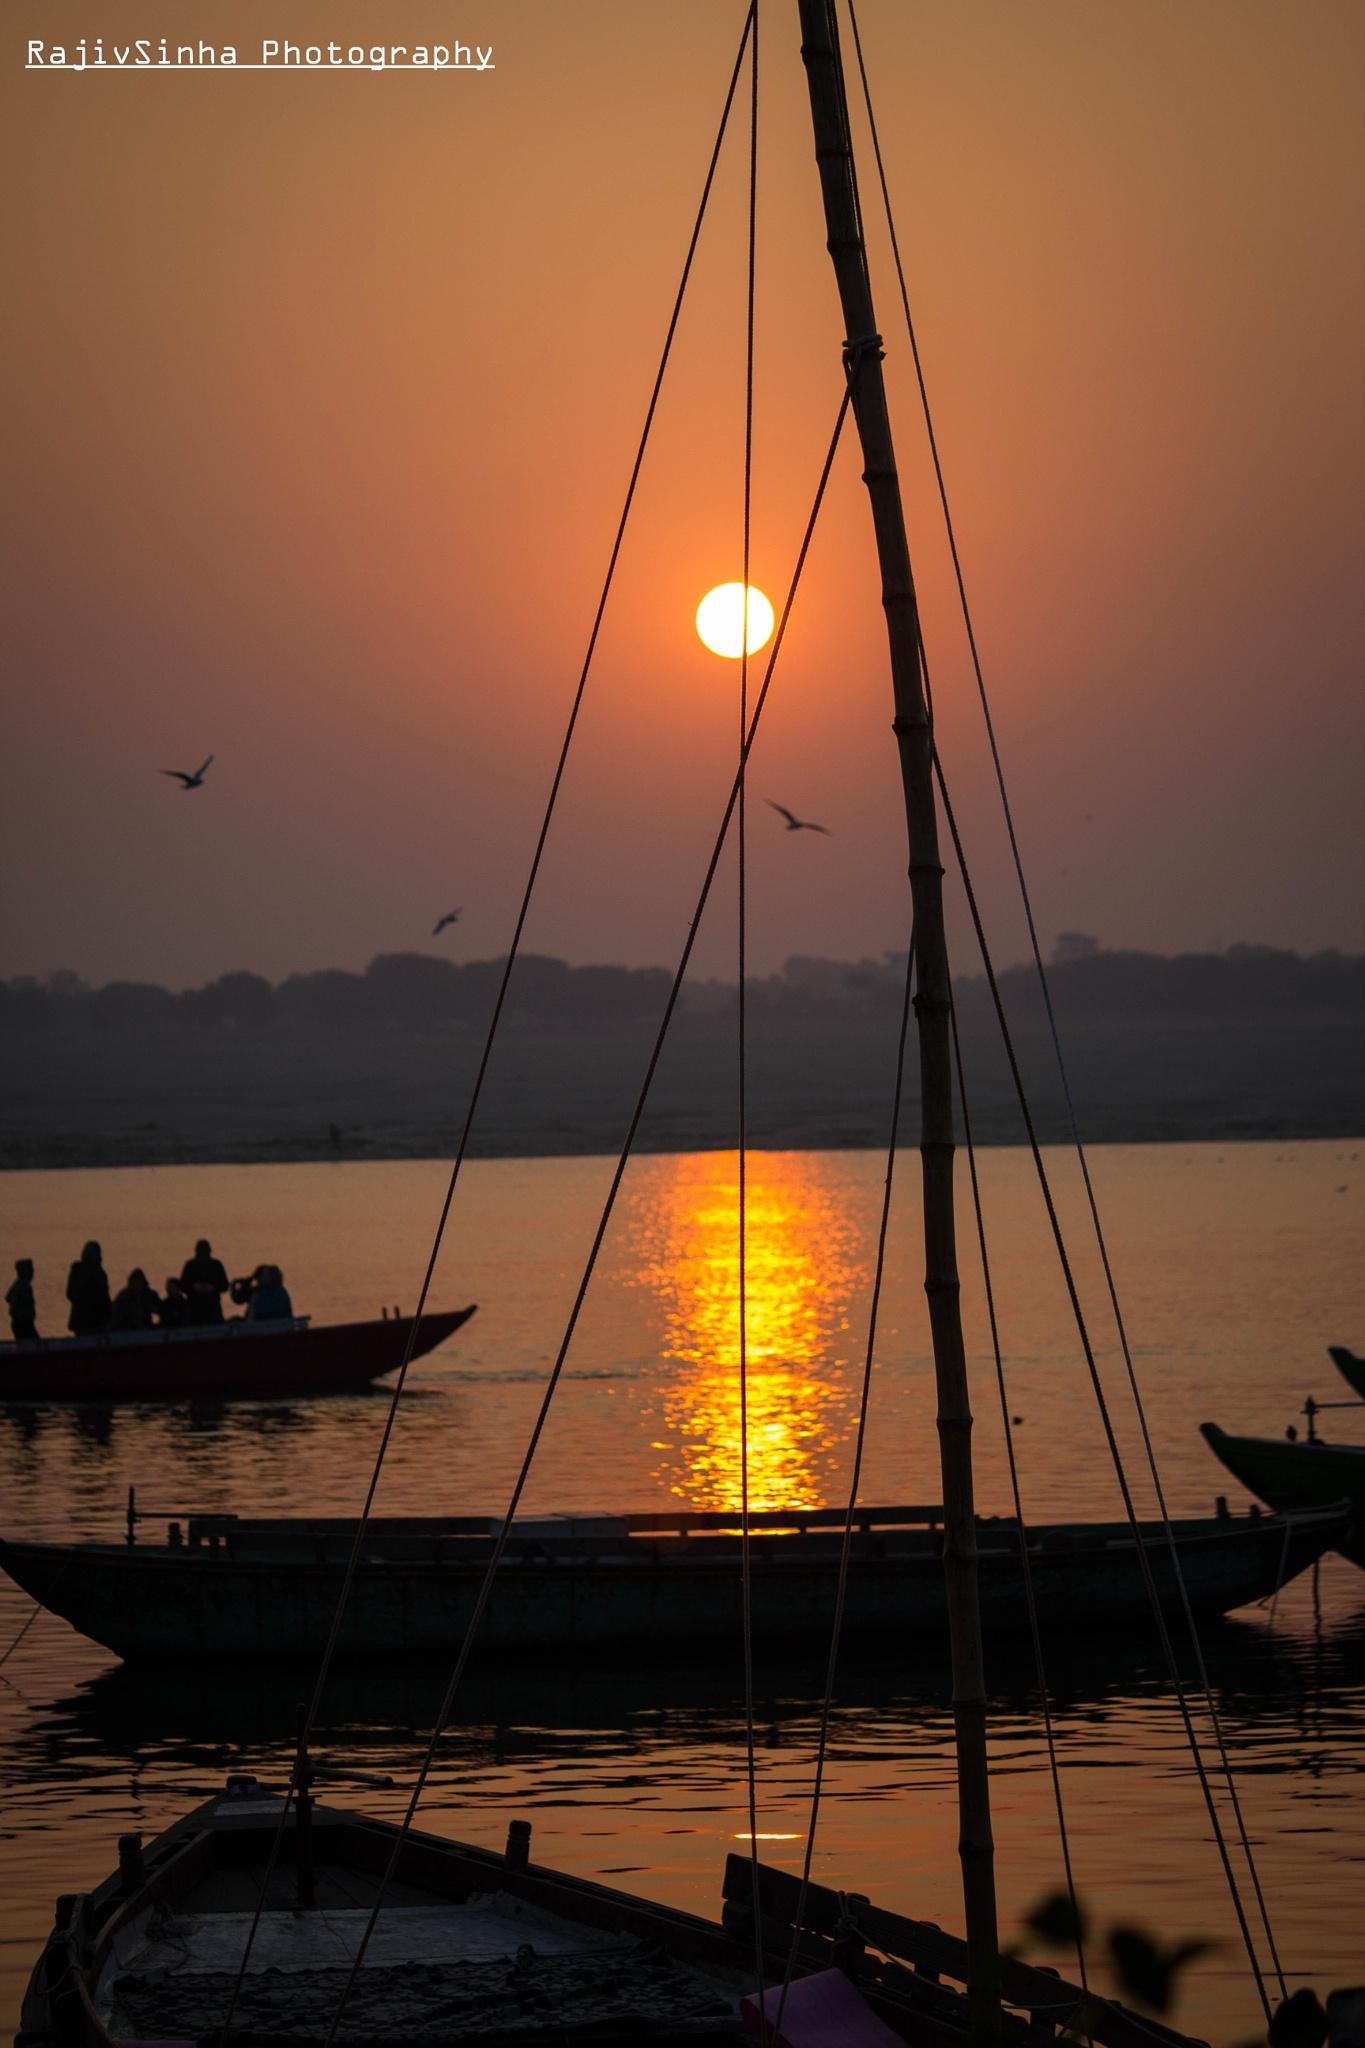 Morning sunshine by Rajiv Sinha Photography